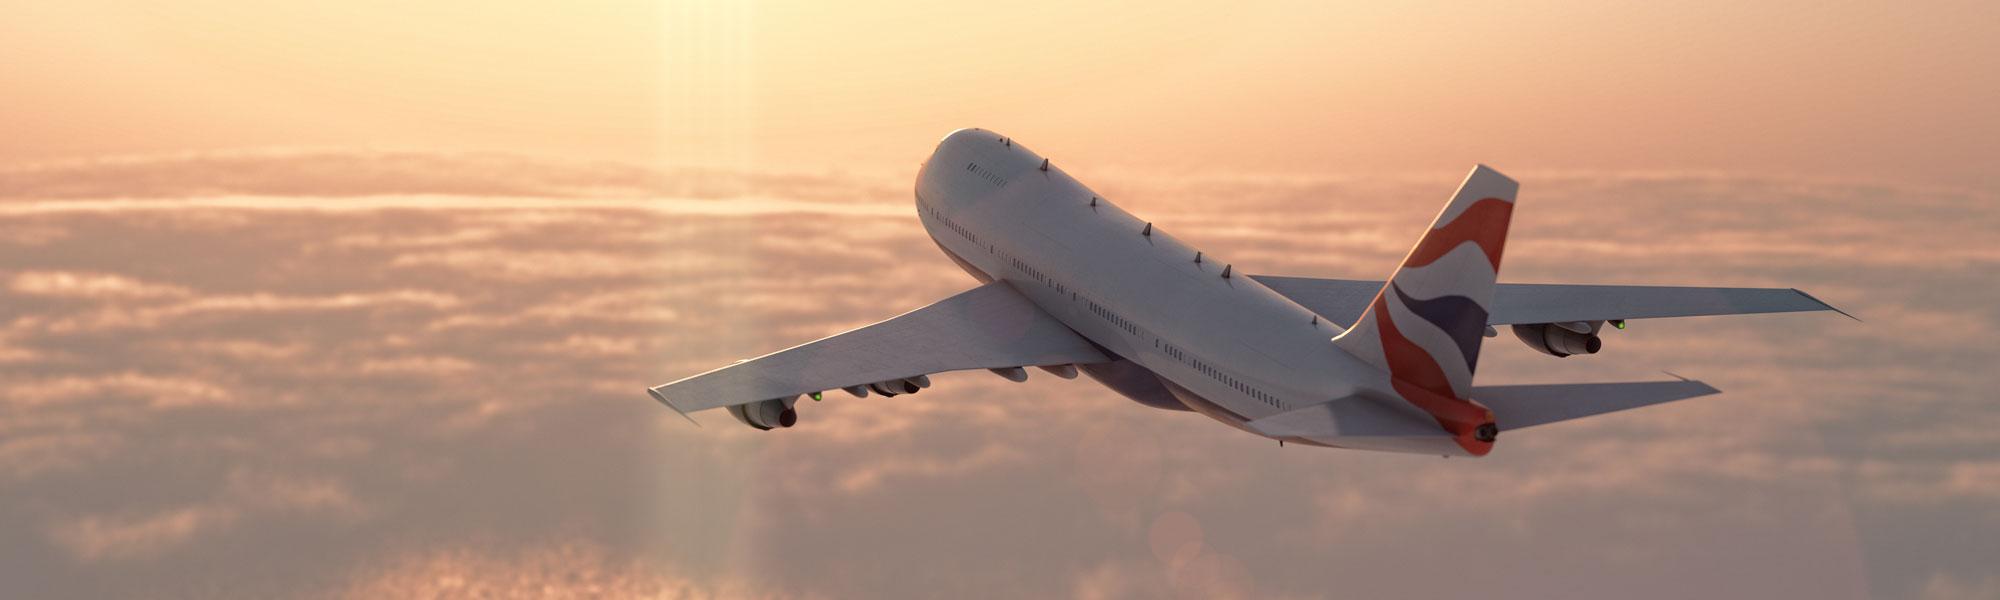 Flugzeug - Reisekombi